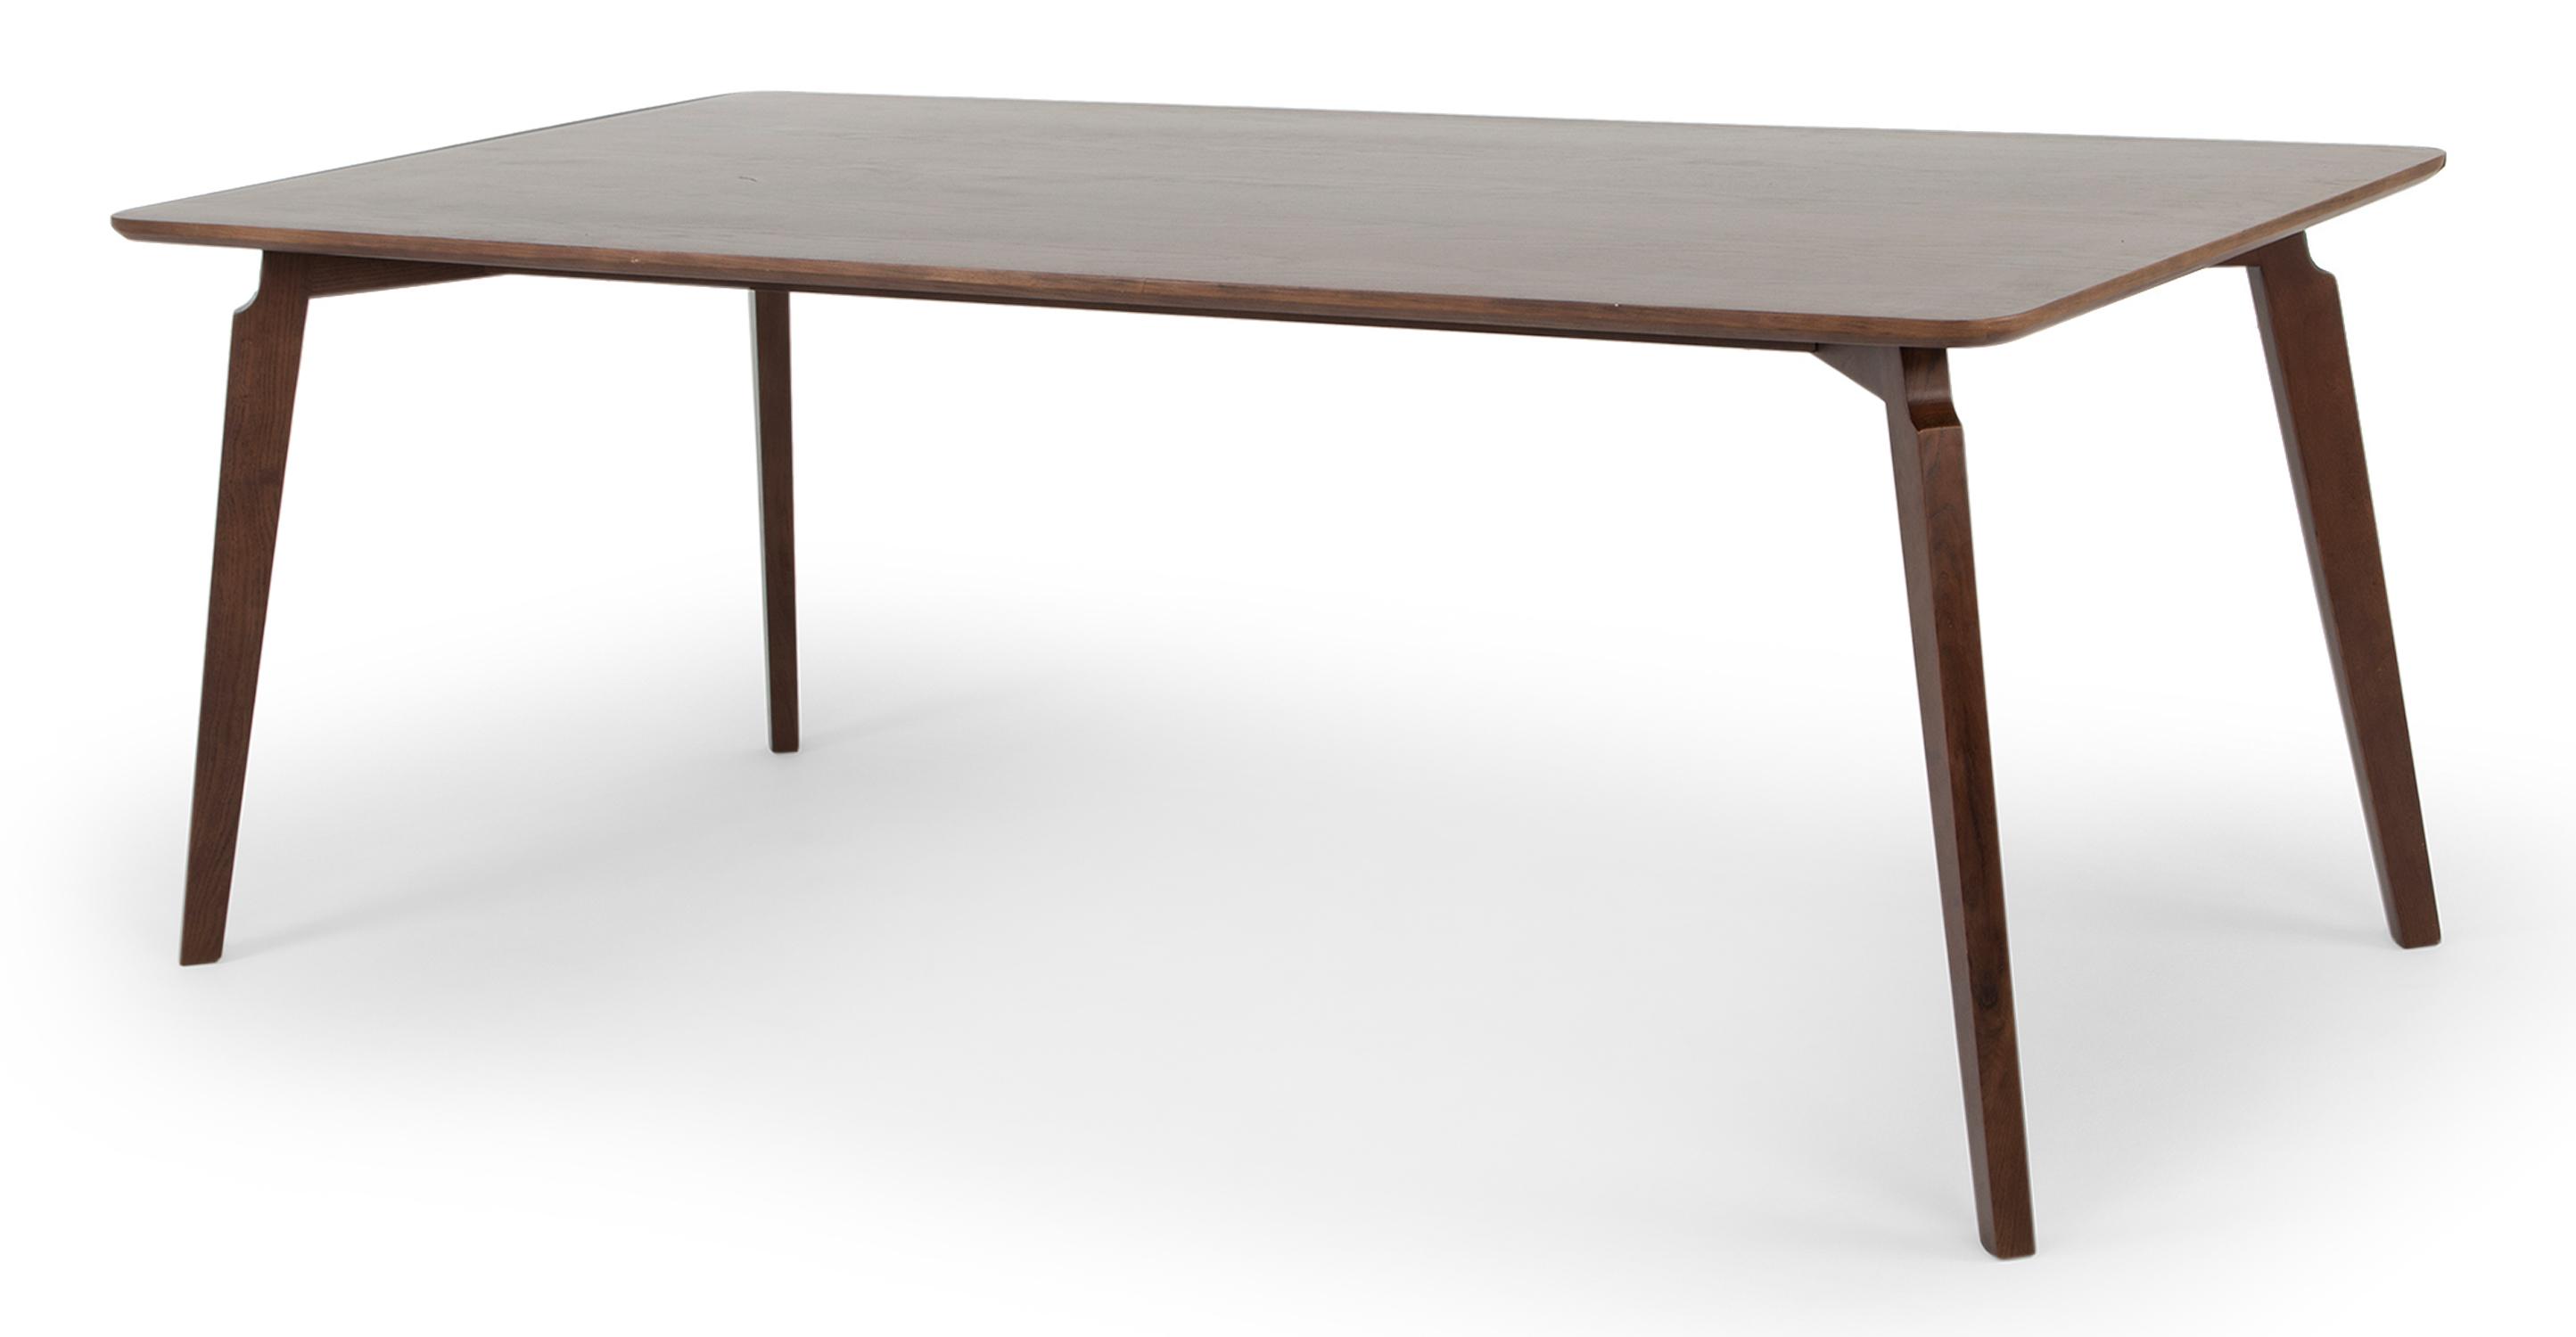 "Kilm 78"" Dining Table, Walnut"